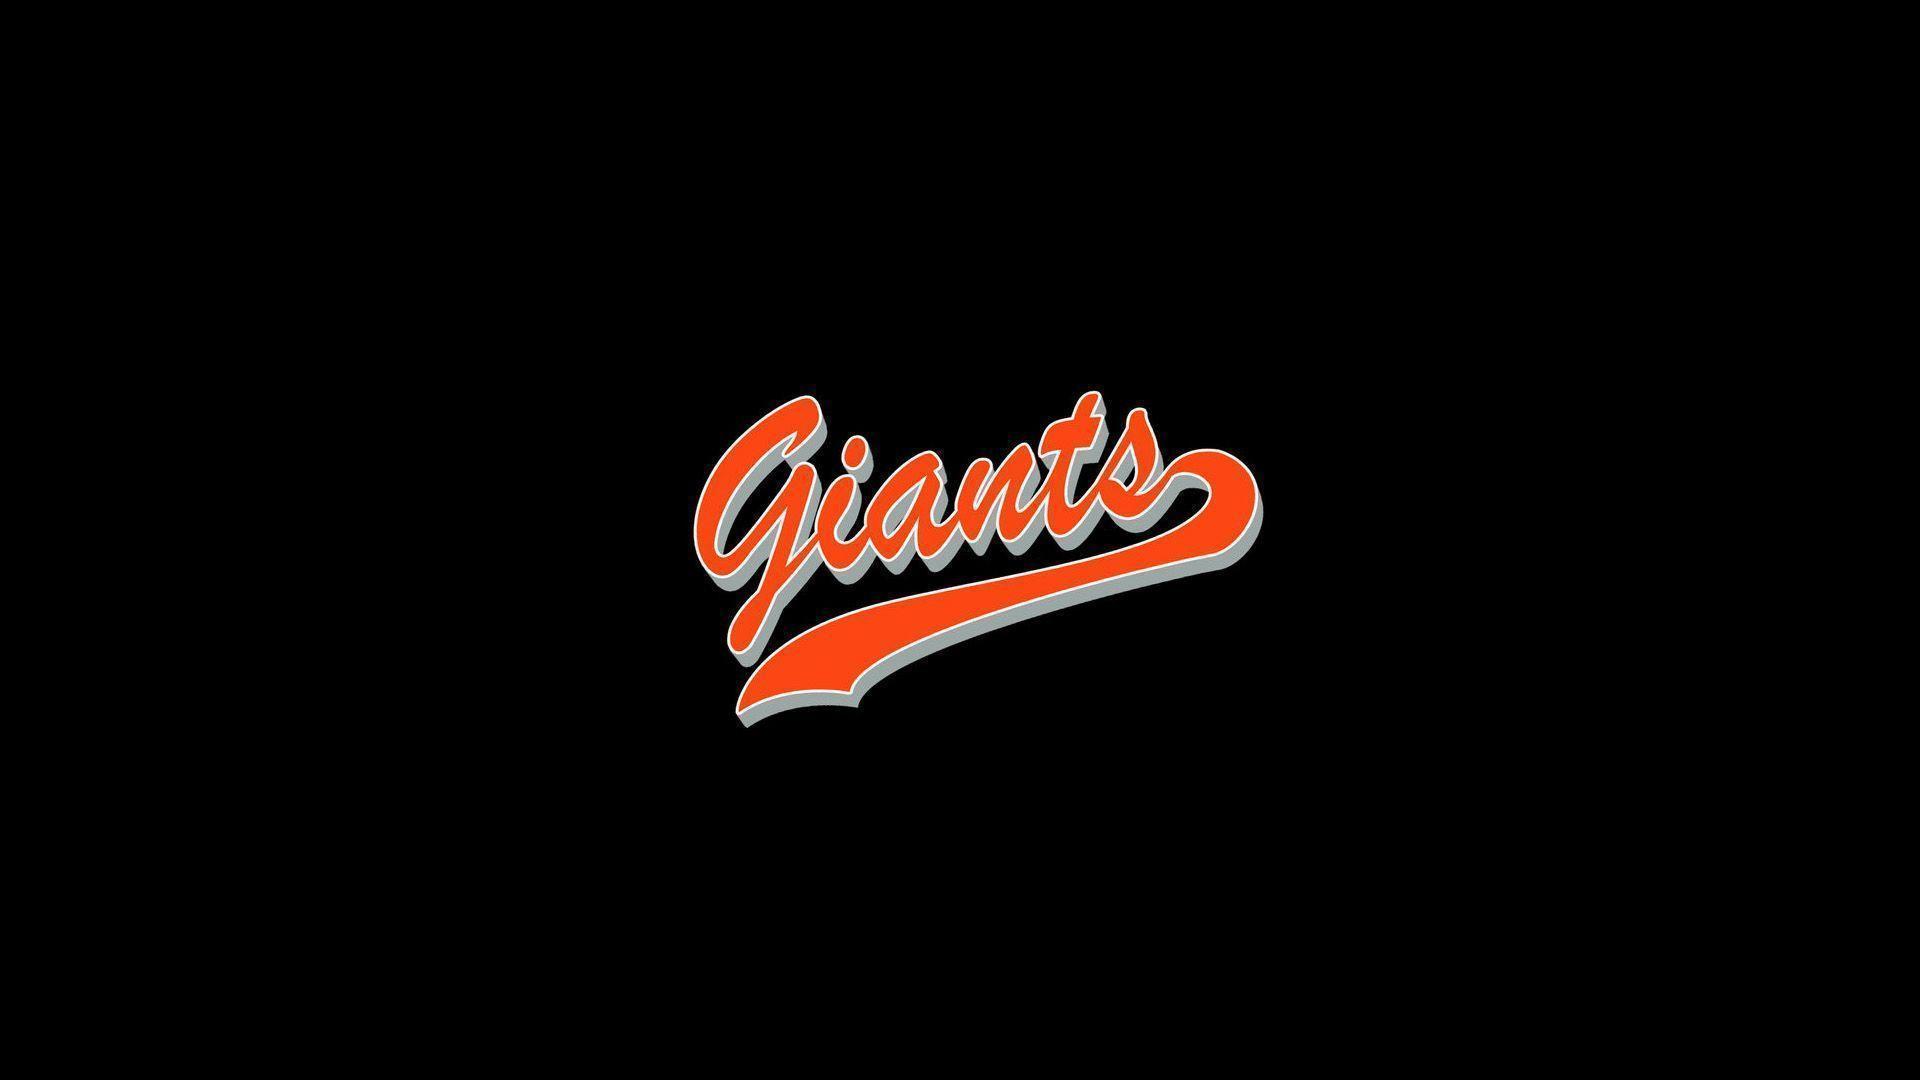 San Francisco Giants Wallpapers 1920x1080